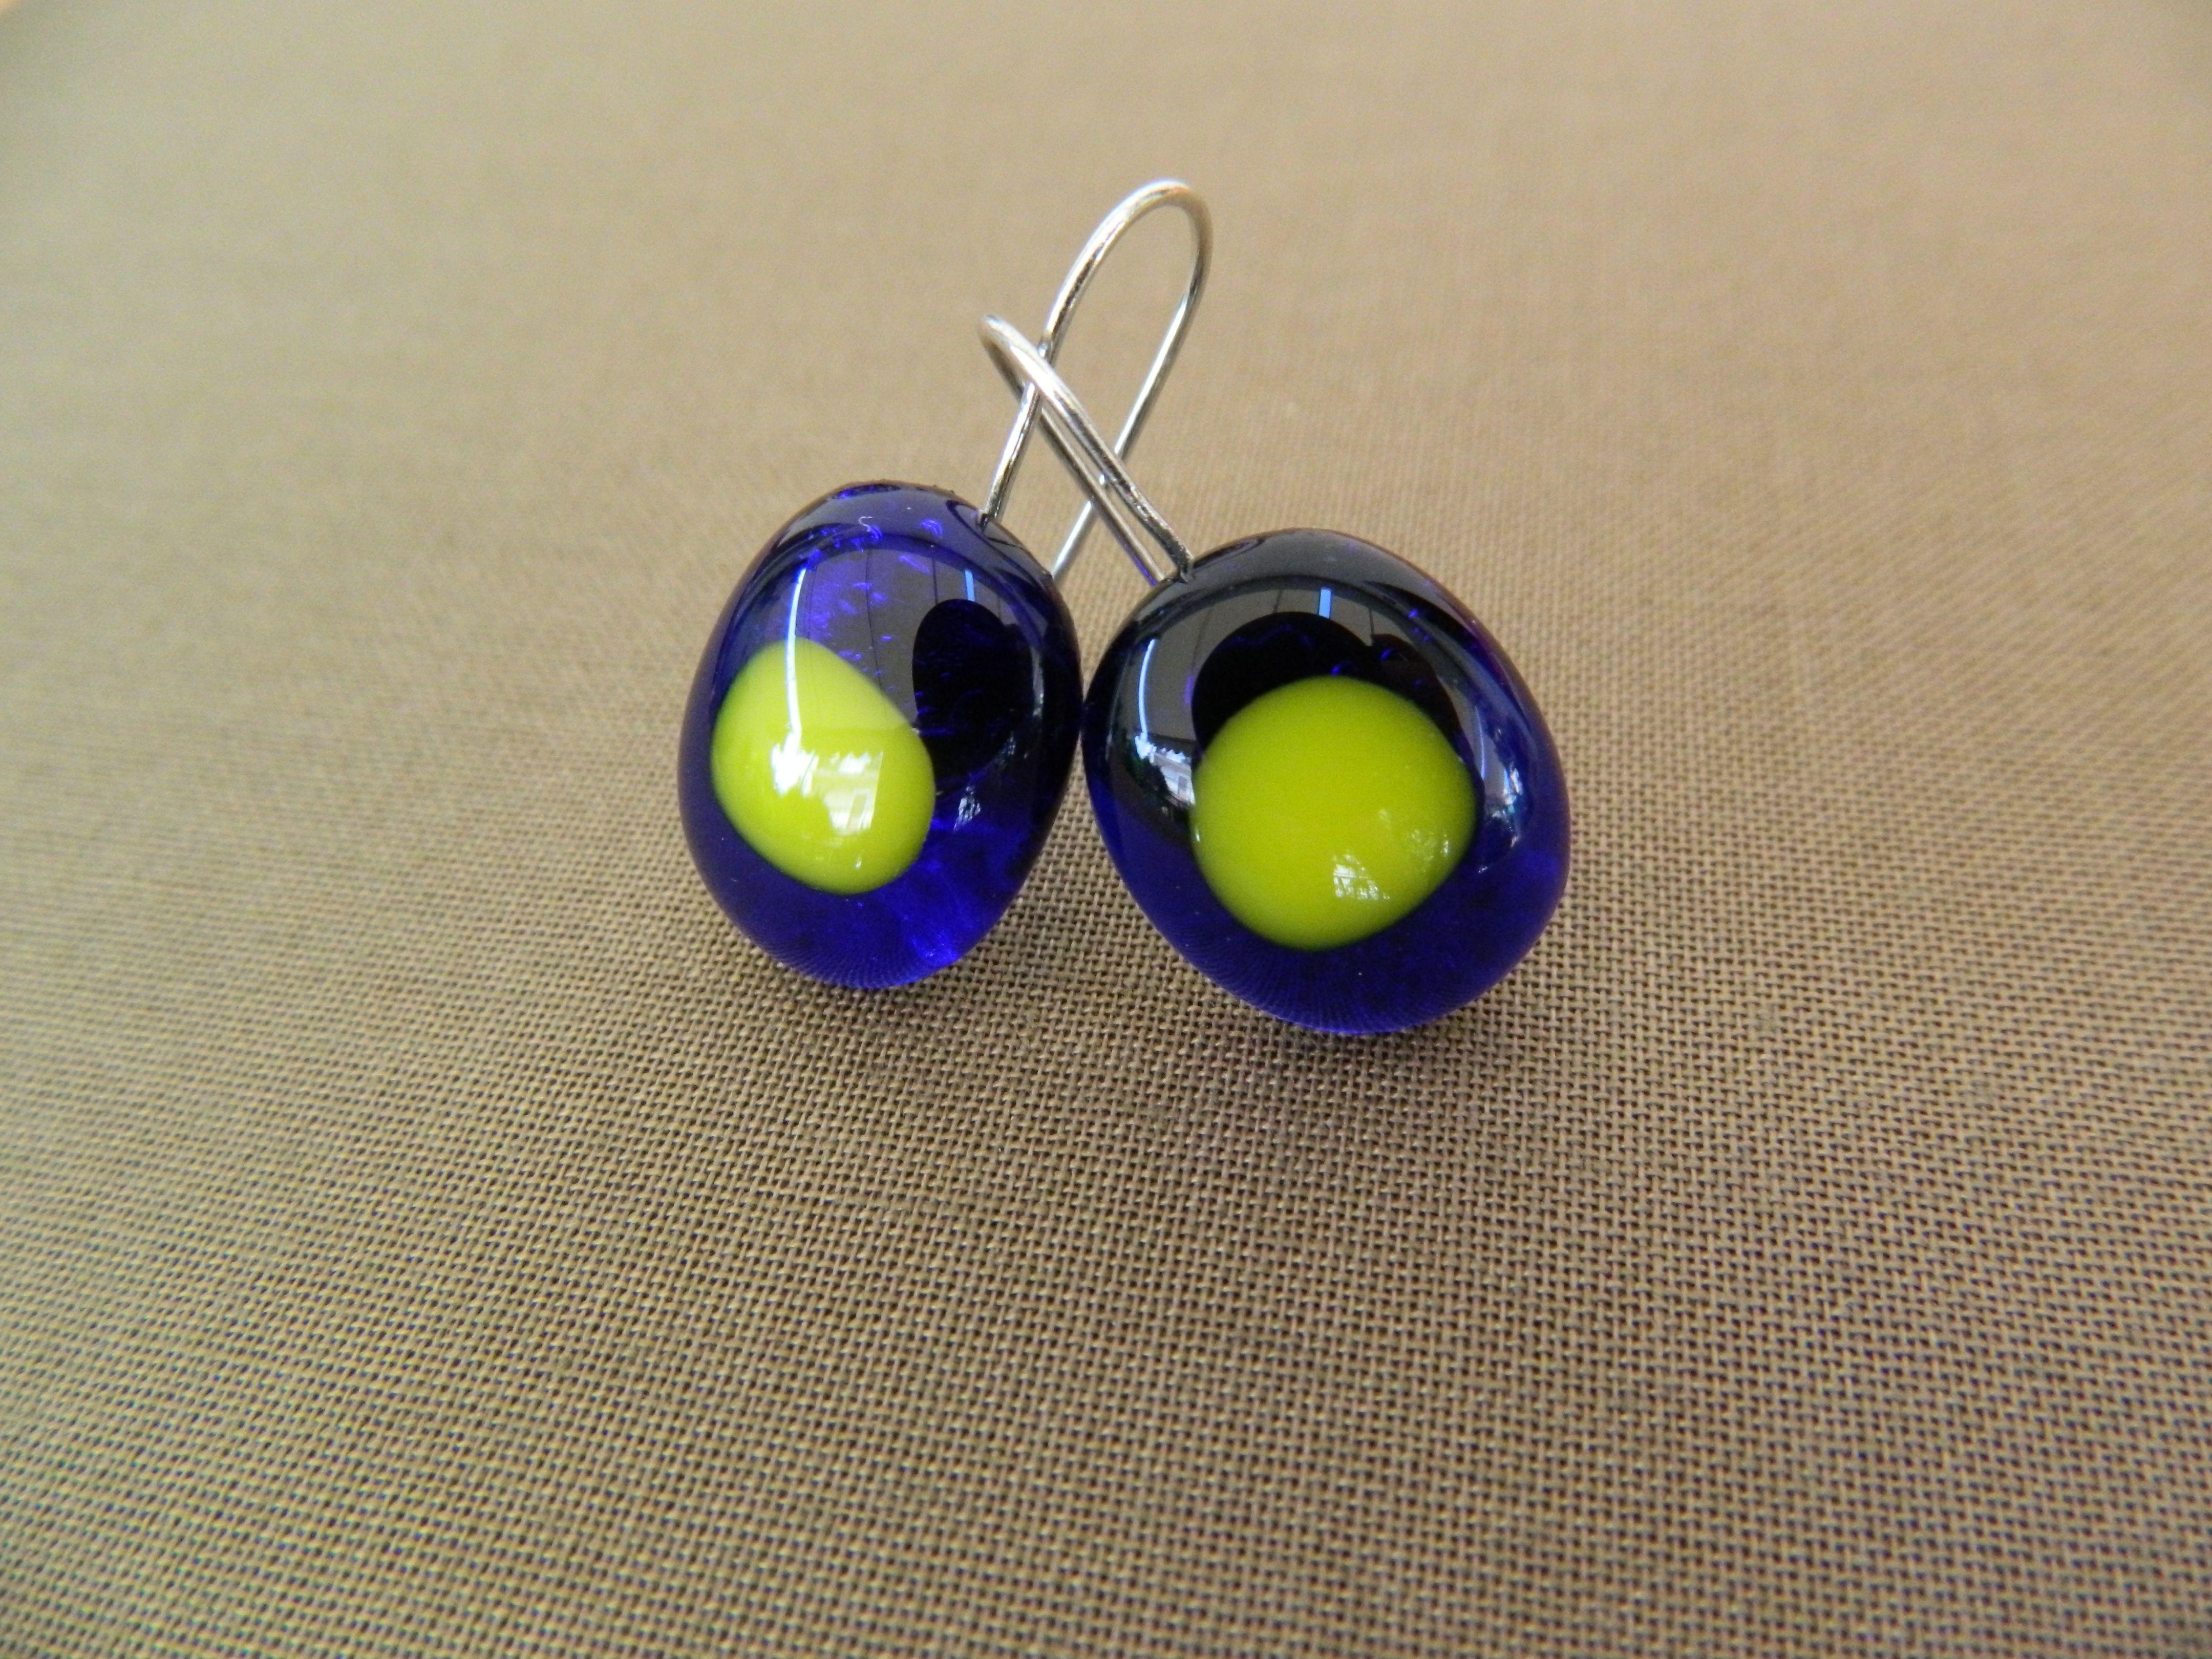 Fused glass blue-yellow earrings